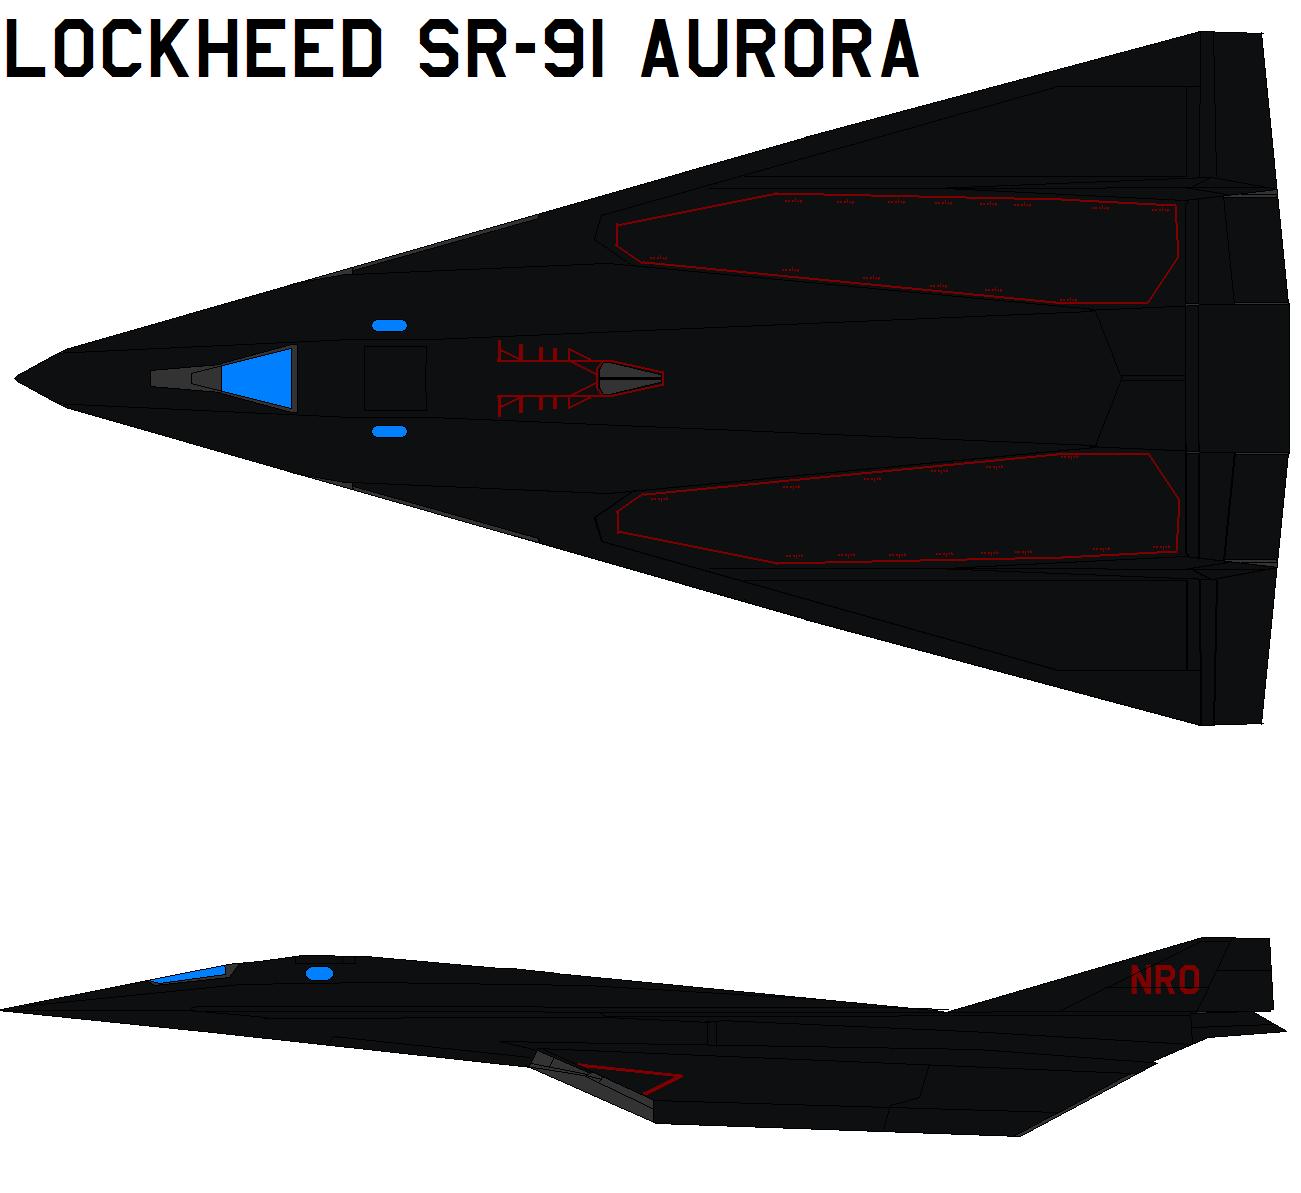 http://fc05.deviantart.net/fs36/f/2008/253/e/9/Lockheed_SR_91_Aurora_by_bagera3005.png